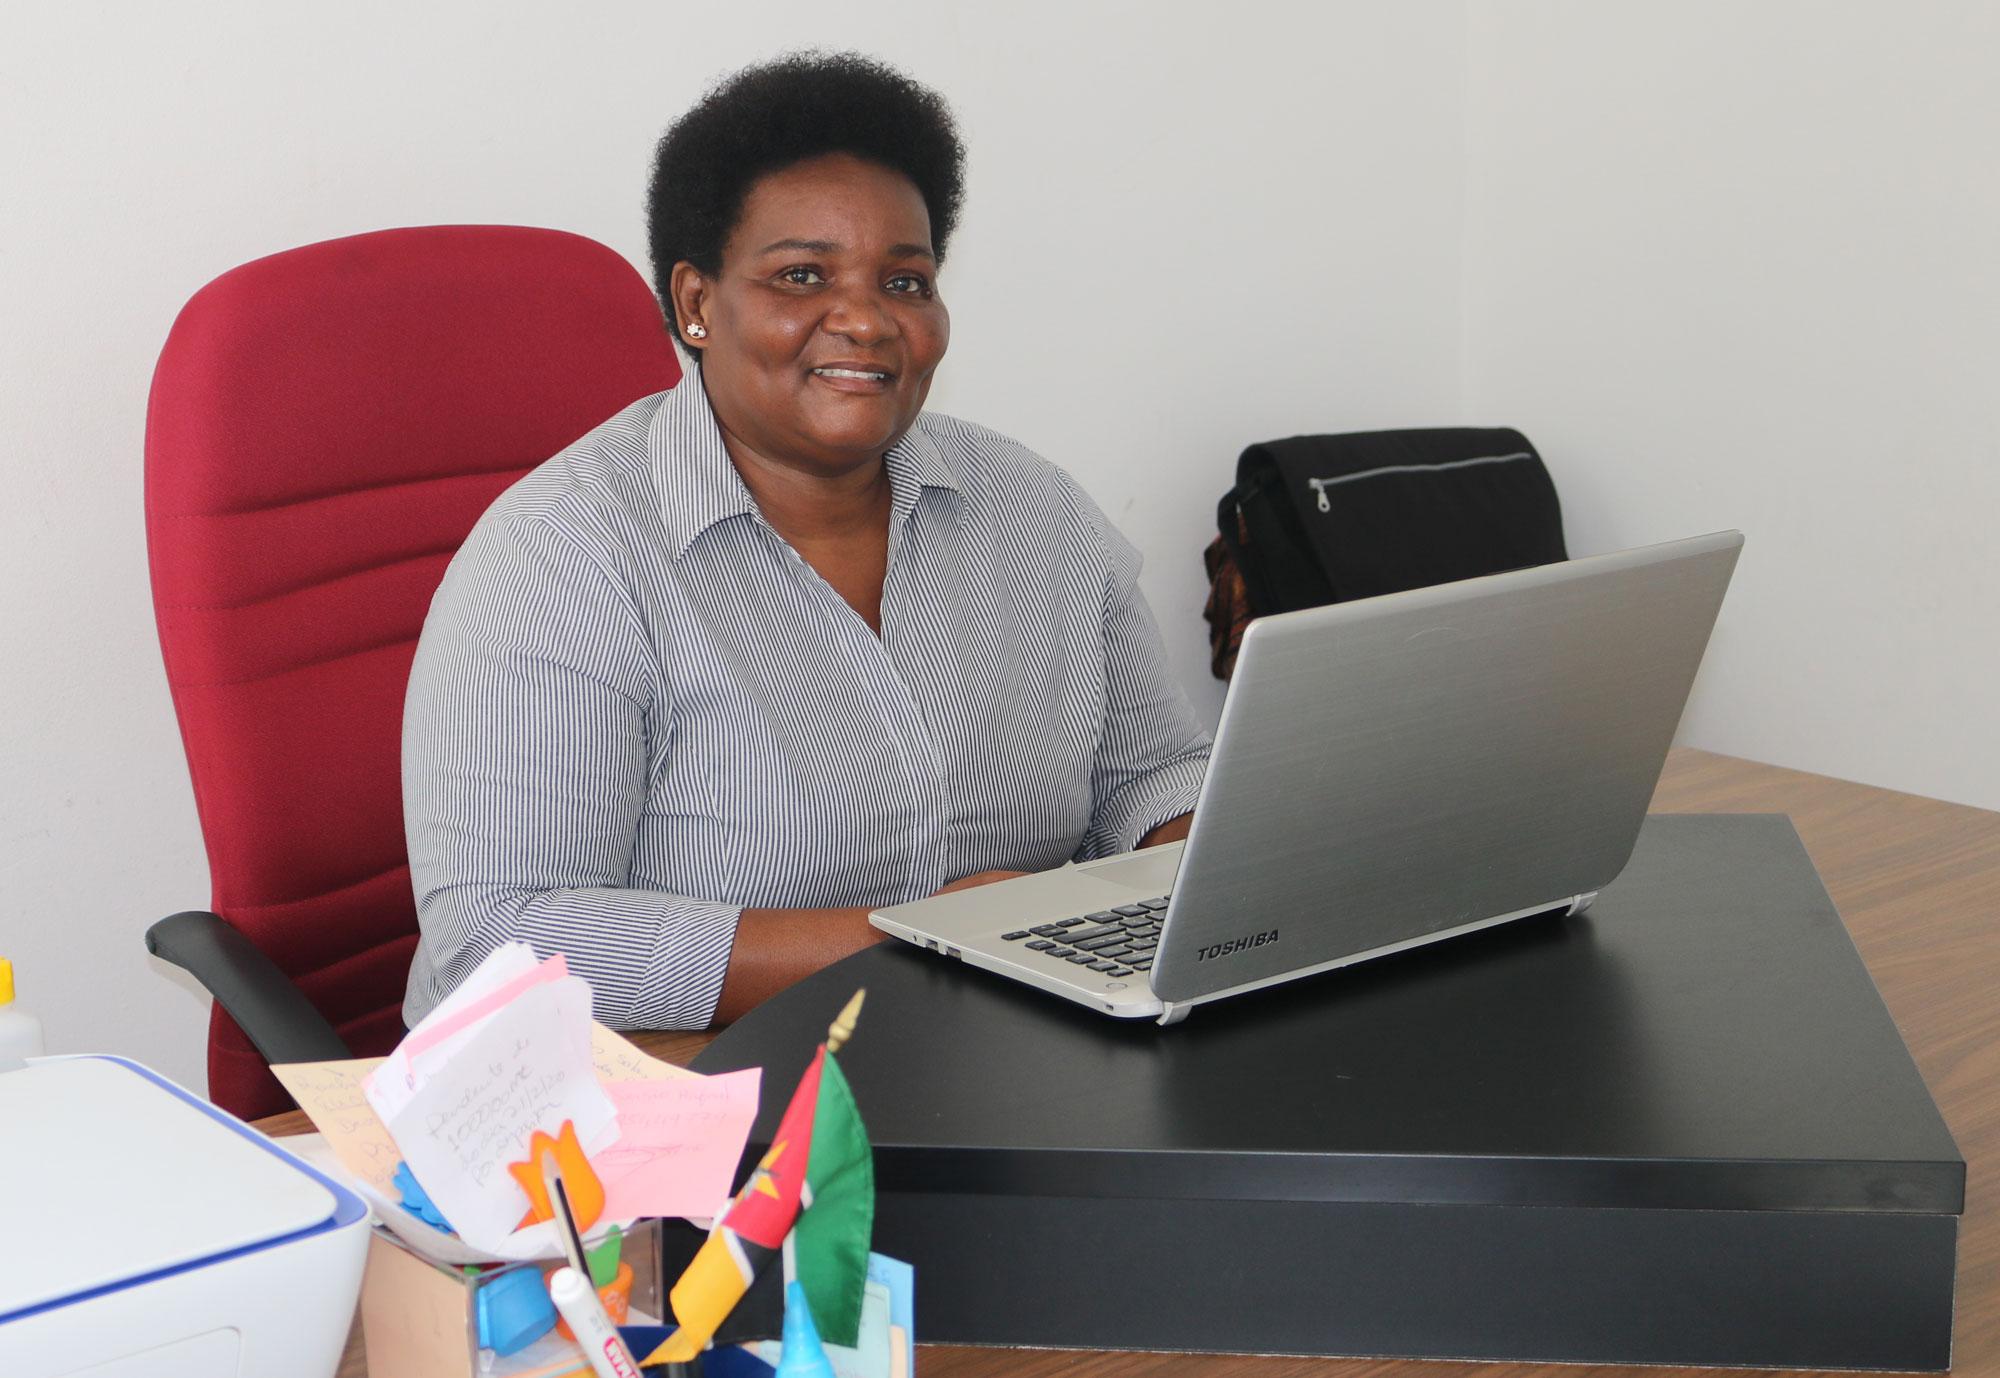 Directora Olga Maria Raimundo, Directora da Escola Comunitária Metodista Unida. Matola, foto de João Filimone Sambo.